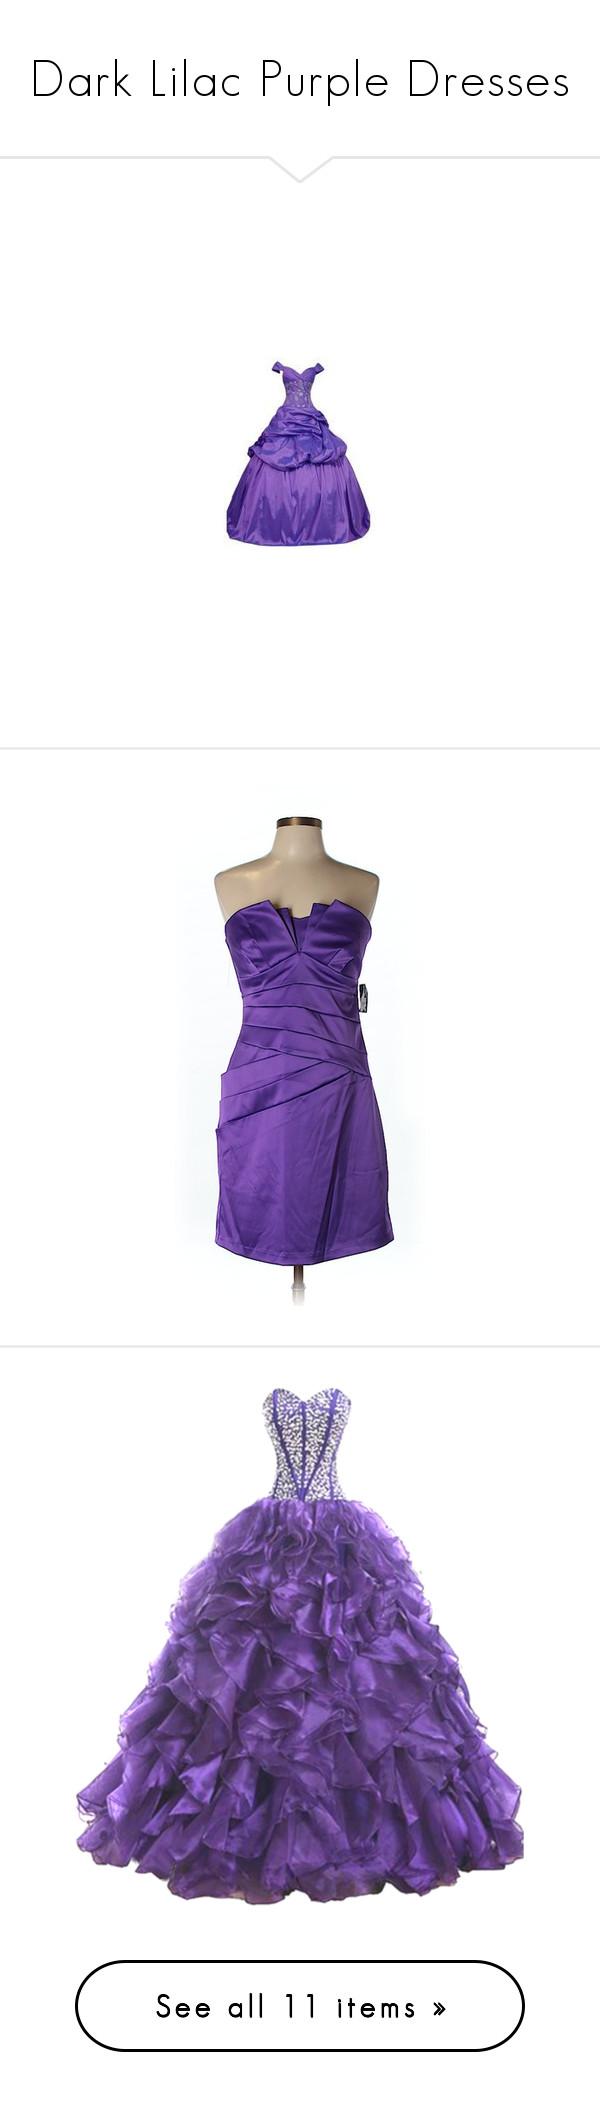 Dark lilac purple dresses